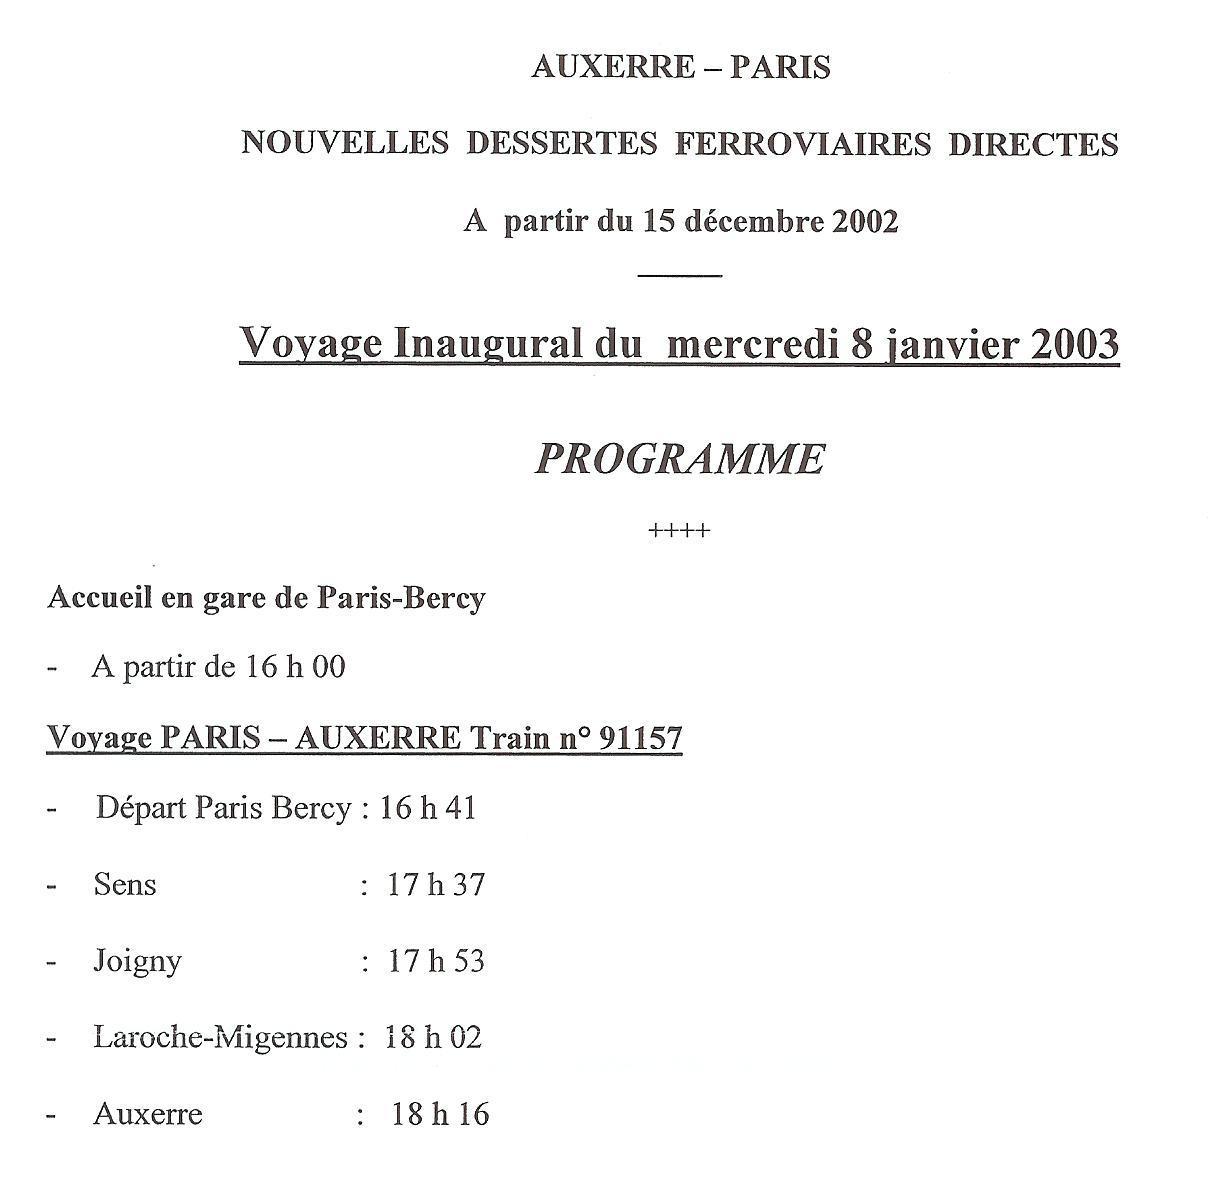 chronique-ter-bourgogne-4-voyage-inaugural-direct-paris-auxerre